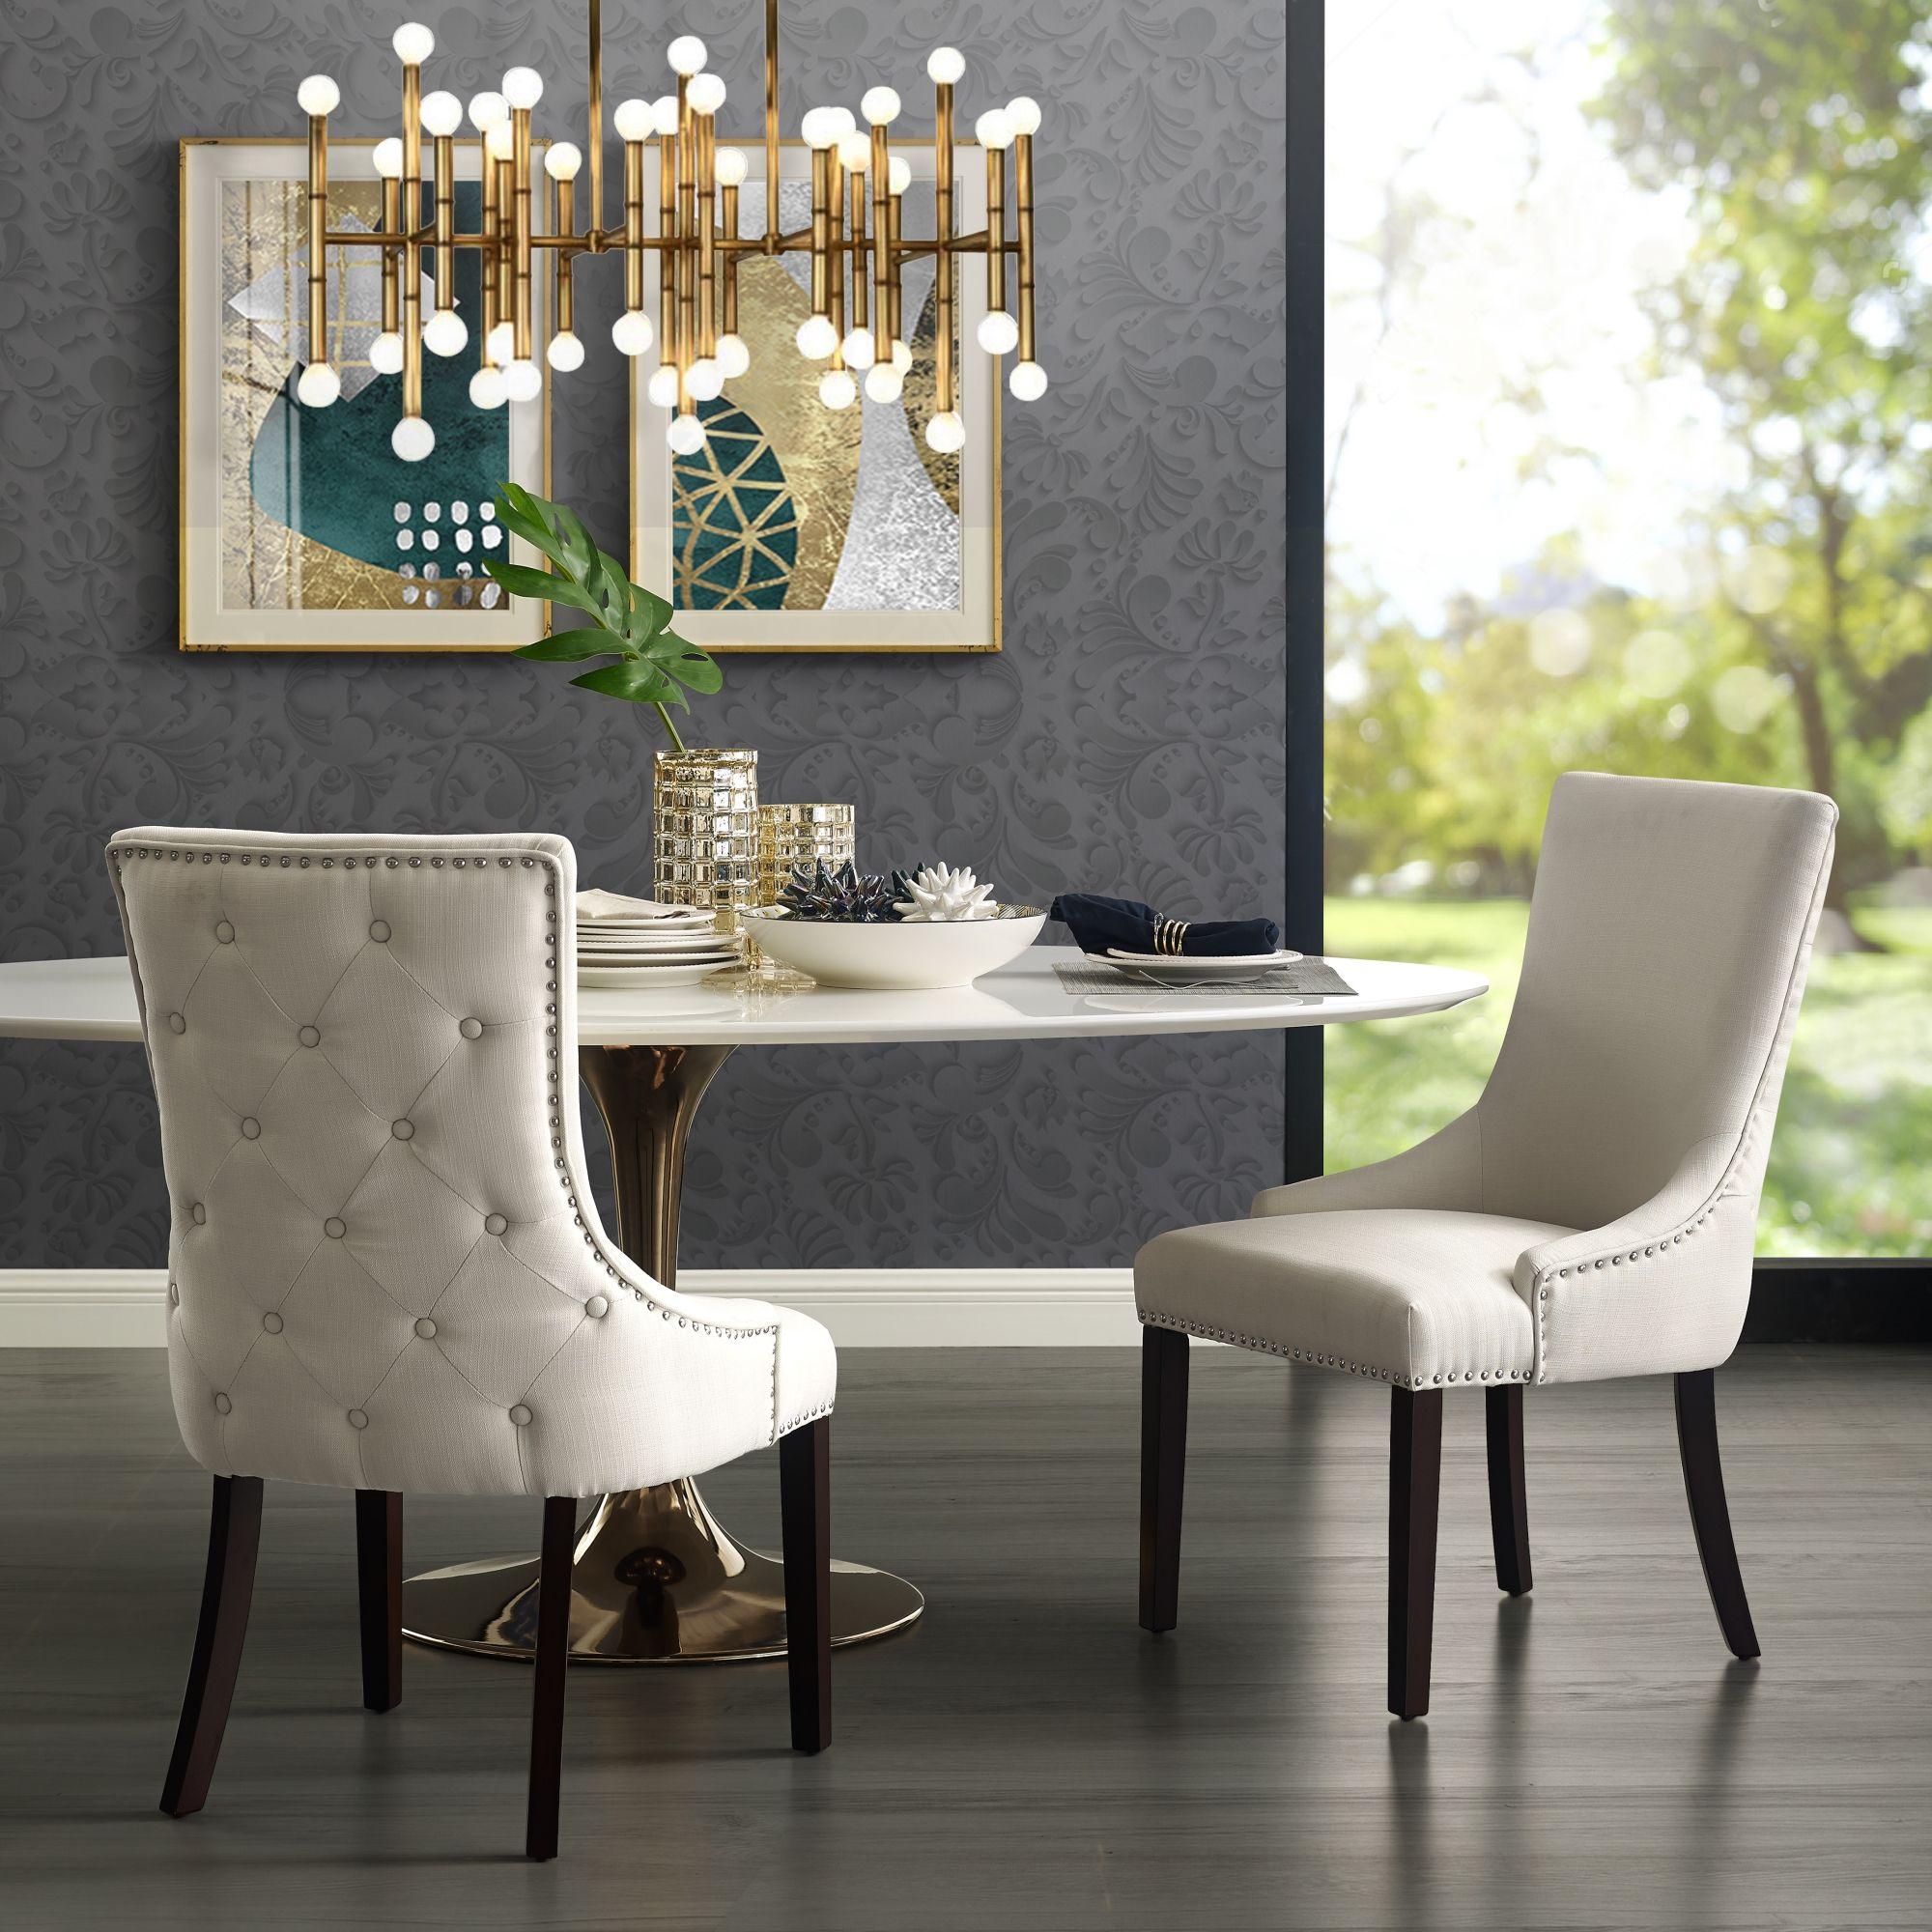 Inspired Home Cream White Linen Dining Chair Button Tufted Armless In 2021 Linen Dining Chairs Dining Chairs White Dining Chairs